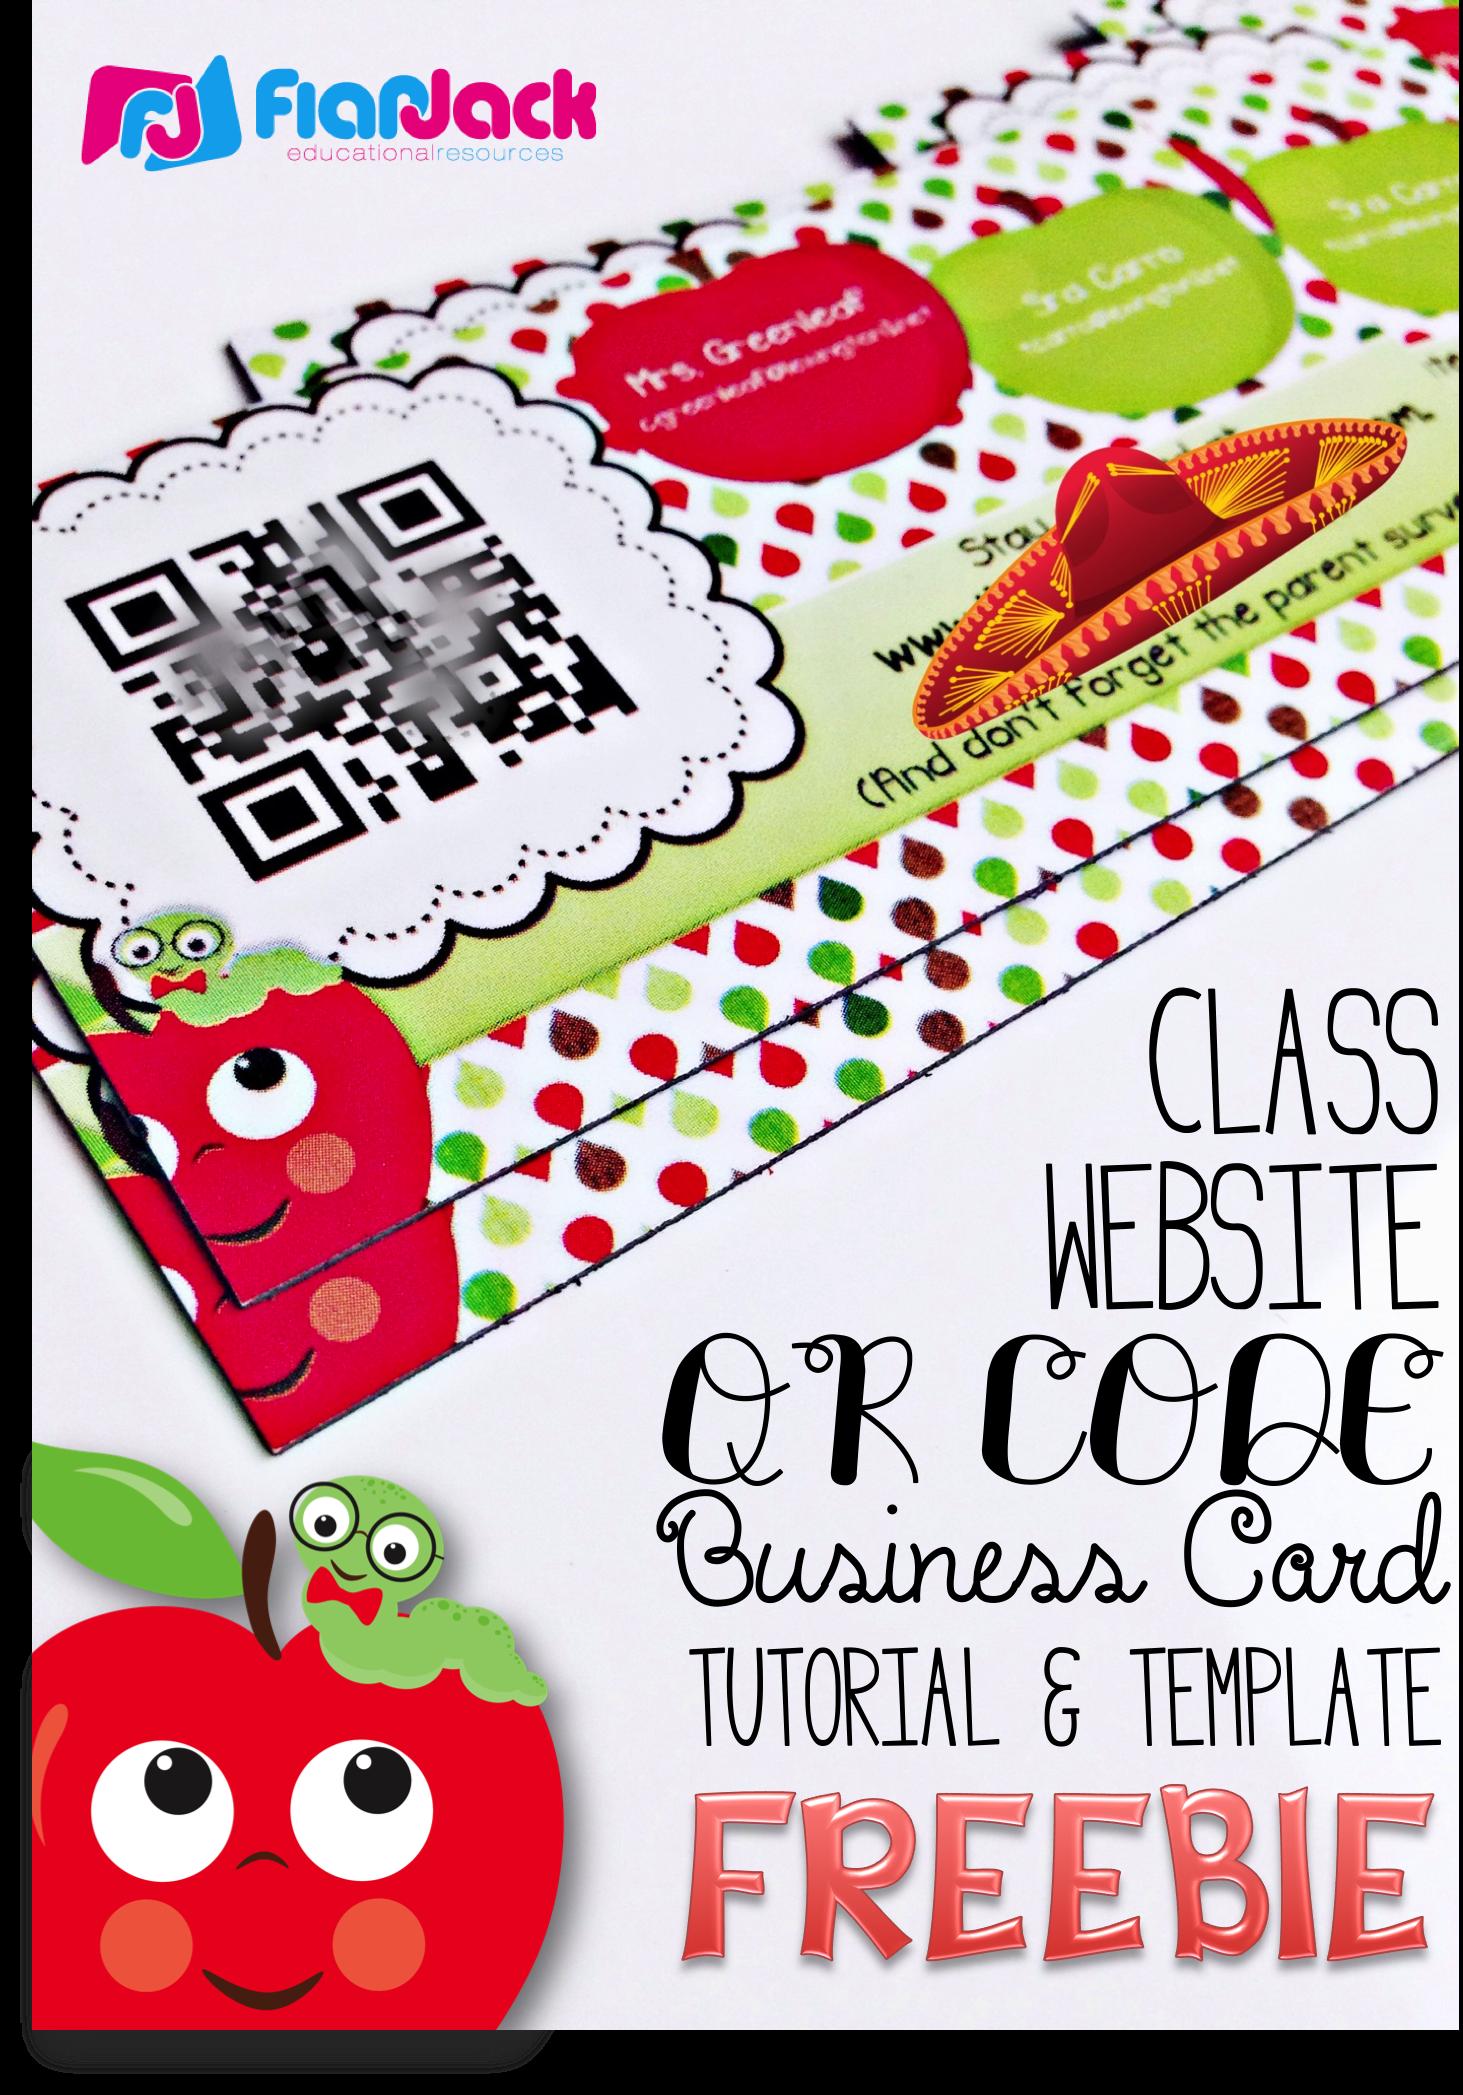 Class Website QR Code Business Cards Template FREEBIE - Create your ...